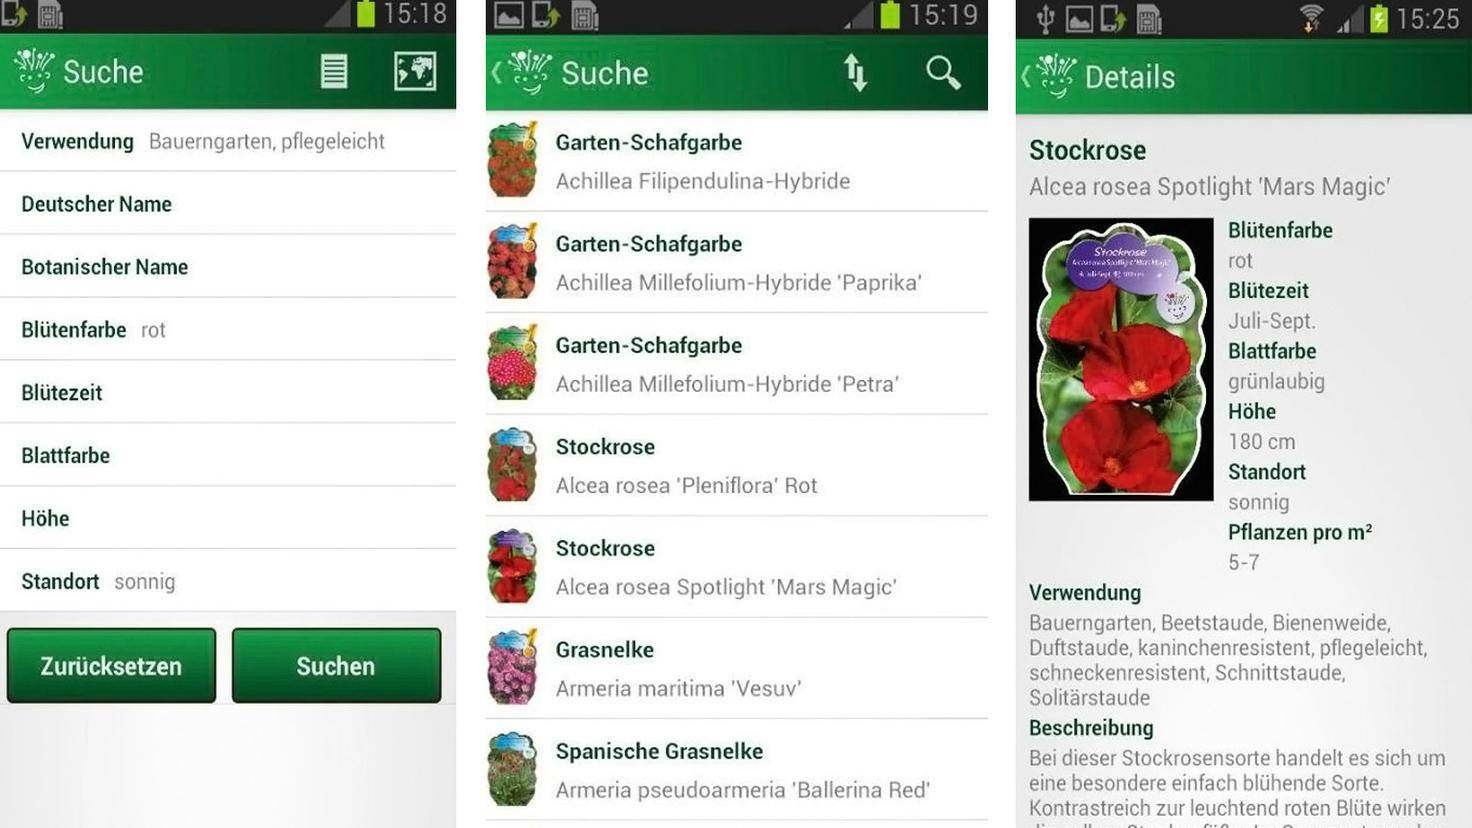 Guide des vivaces App-Google Play Store-Ralf Köster